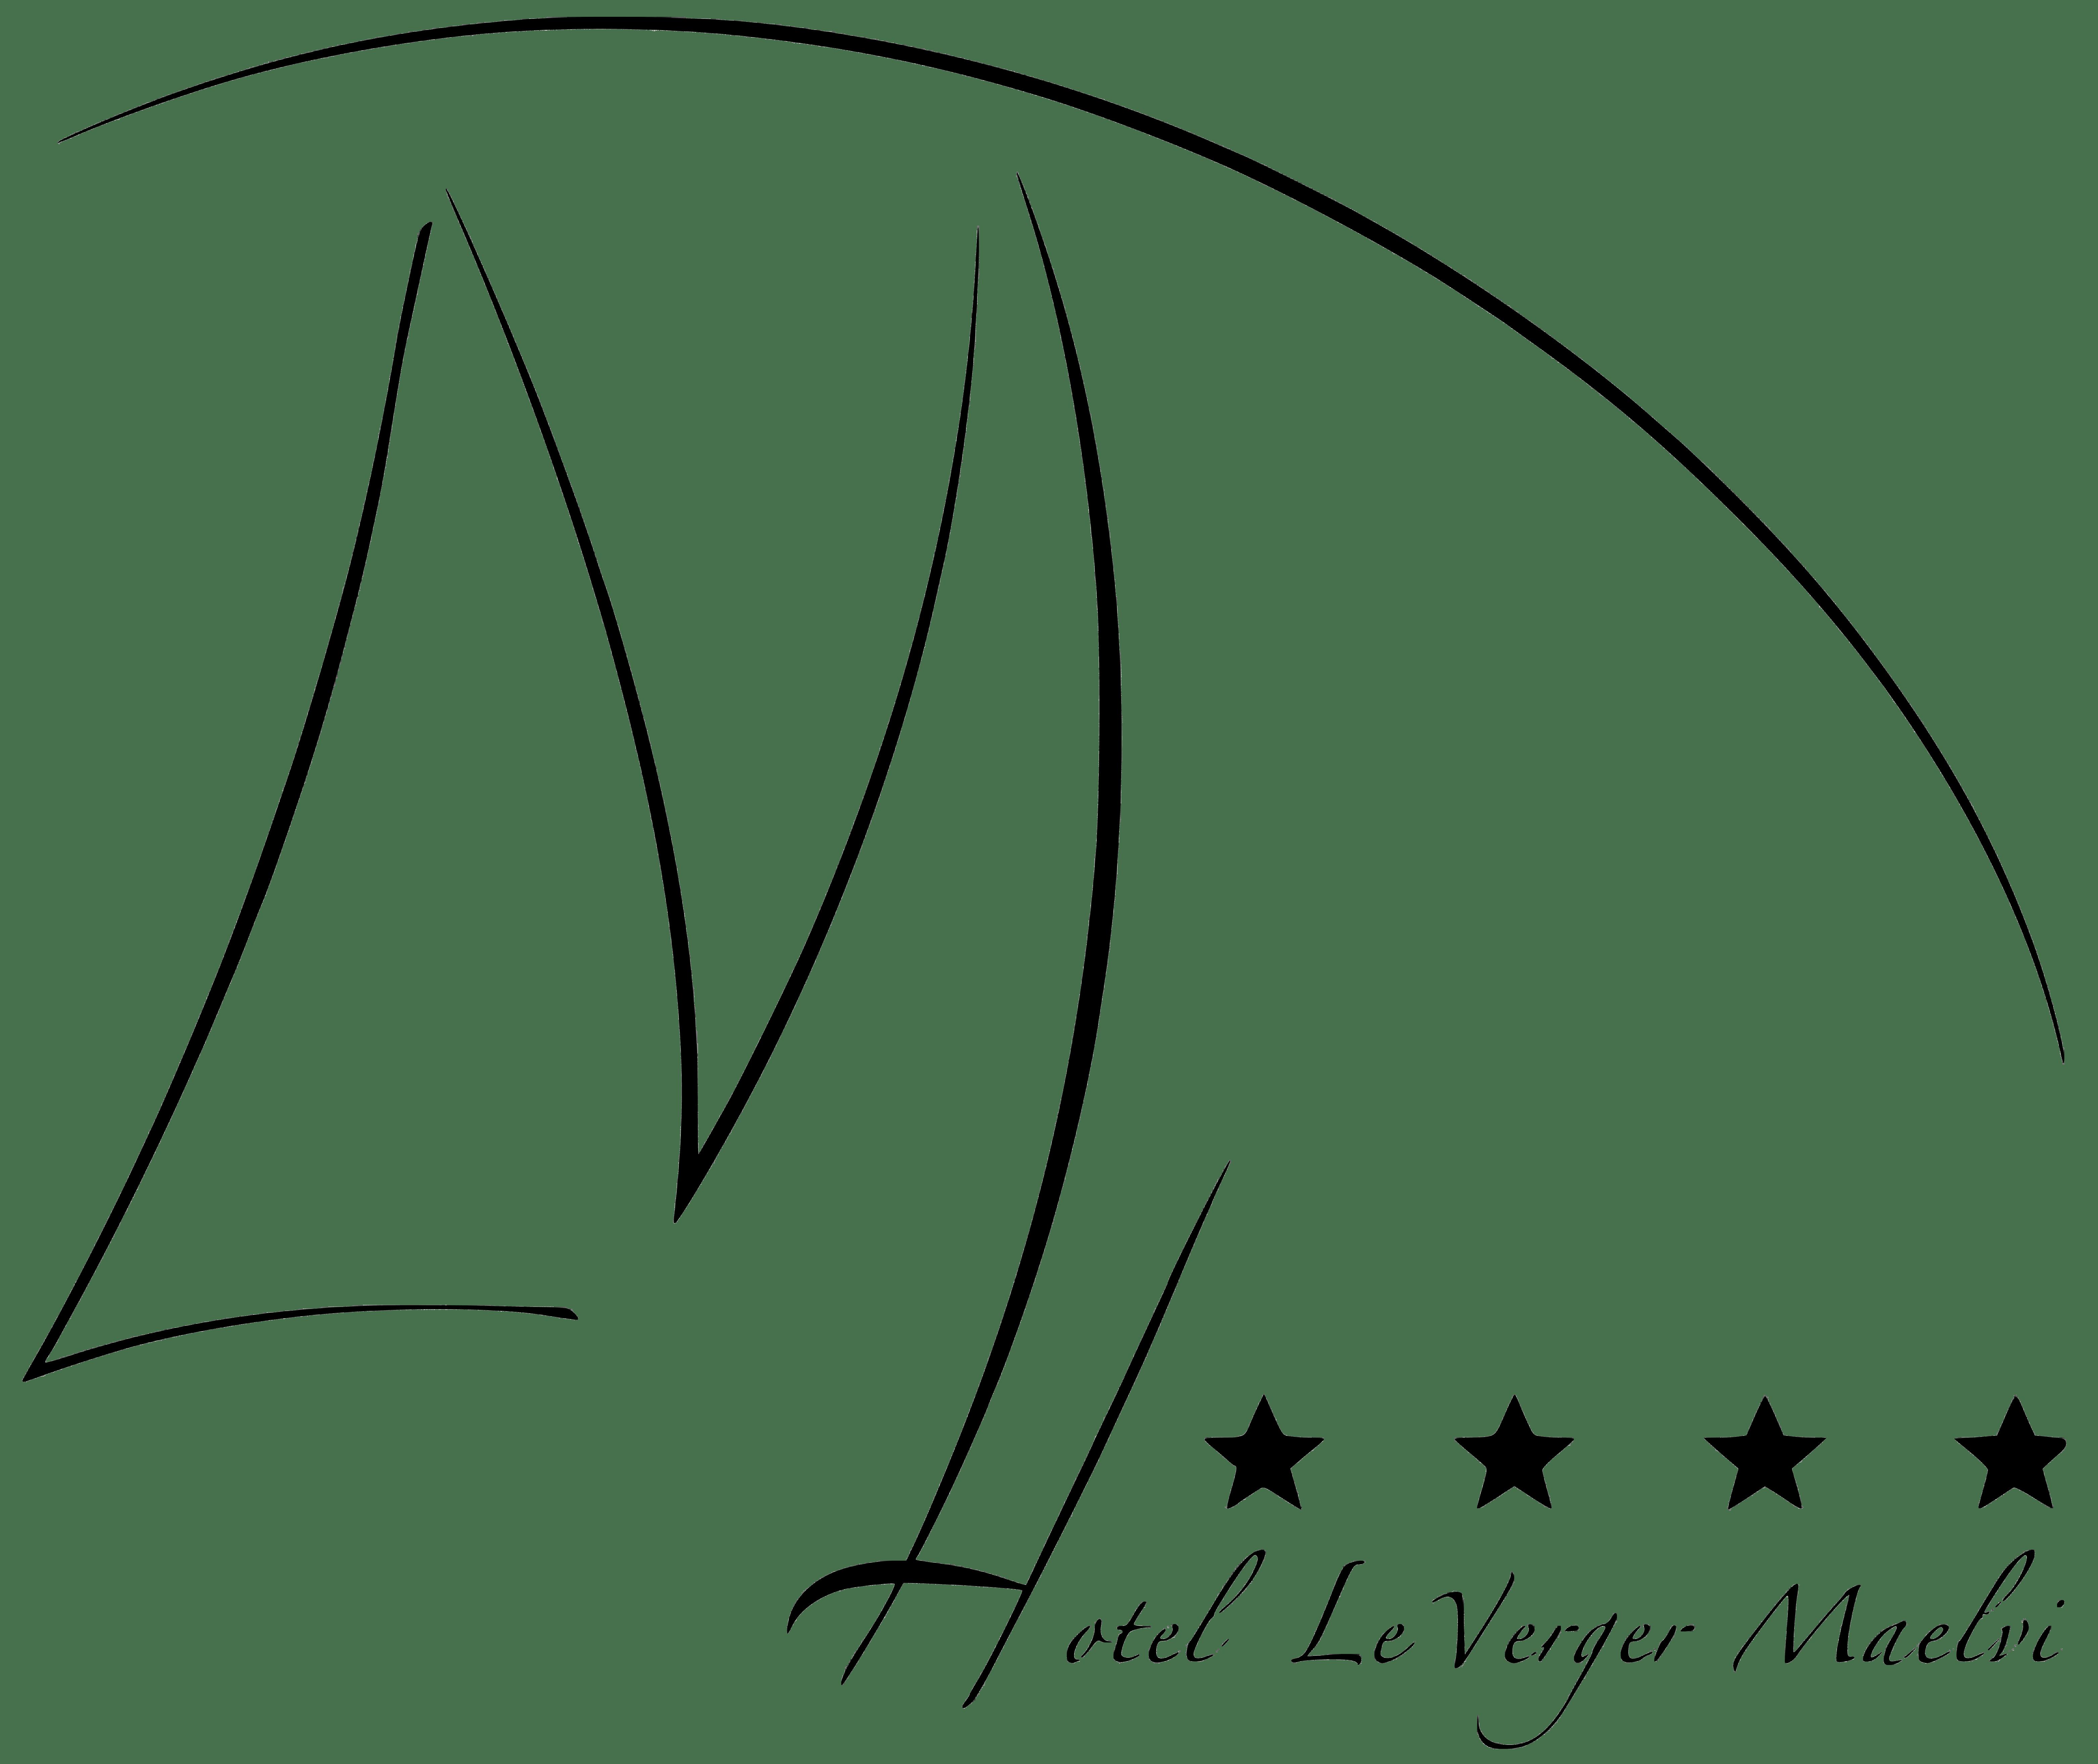 Le Verger Maelvi